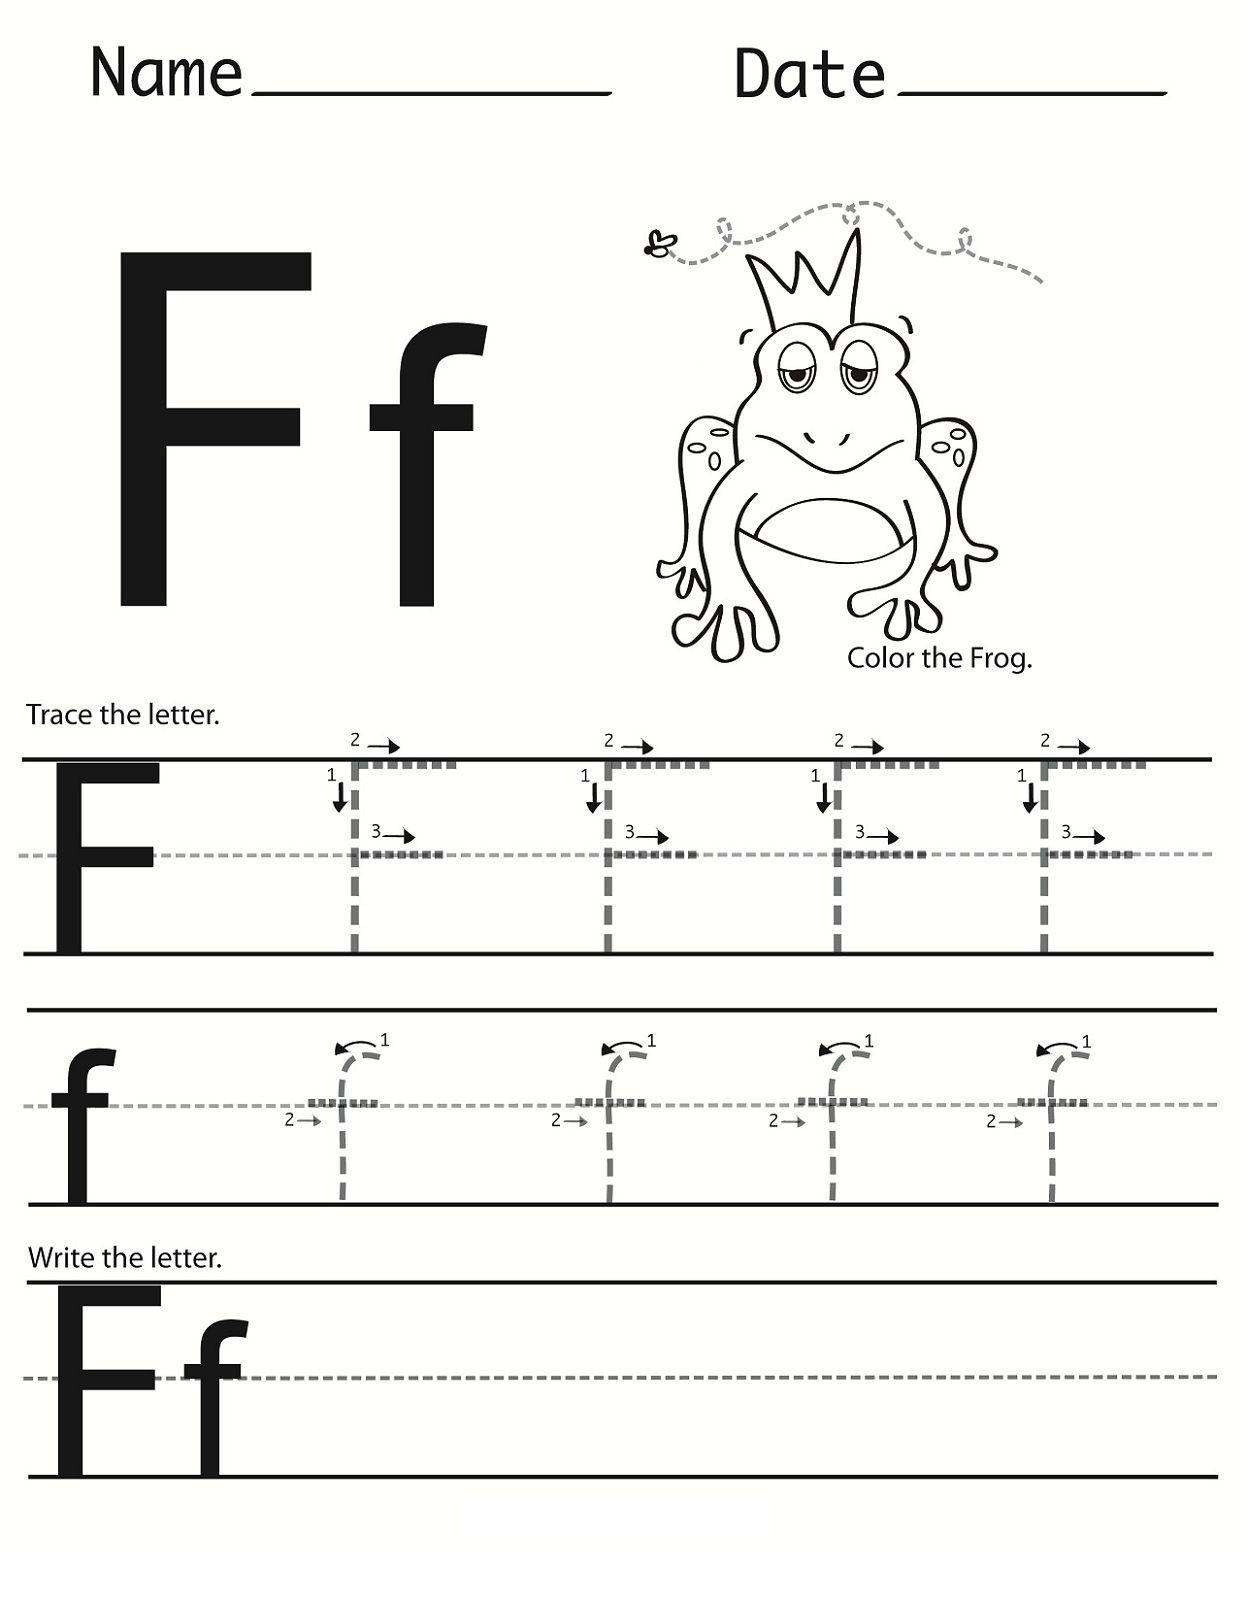 Letter F Worksheet For Preschool And Kindergarten with Letter F Tracing Worksheets Preschool